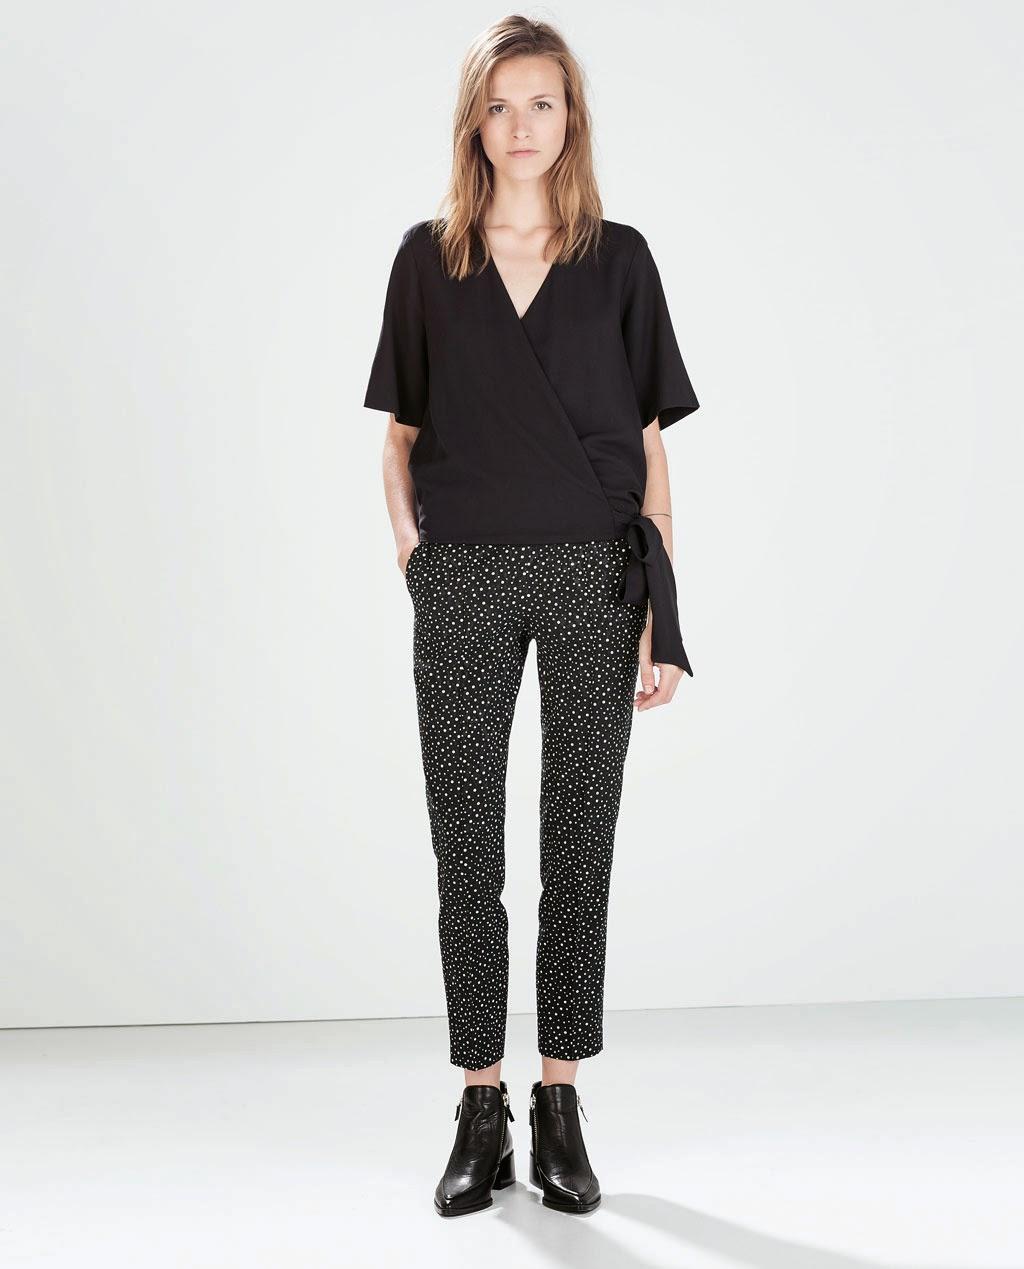 http://www.zara.com/us/en/woman/trousers/polka-dot-jacquard-chinos-c269187p2163546.html